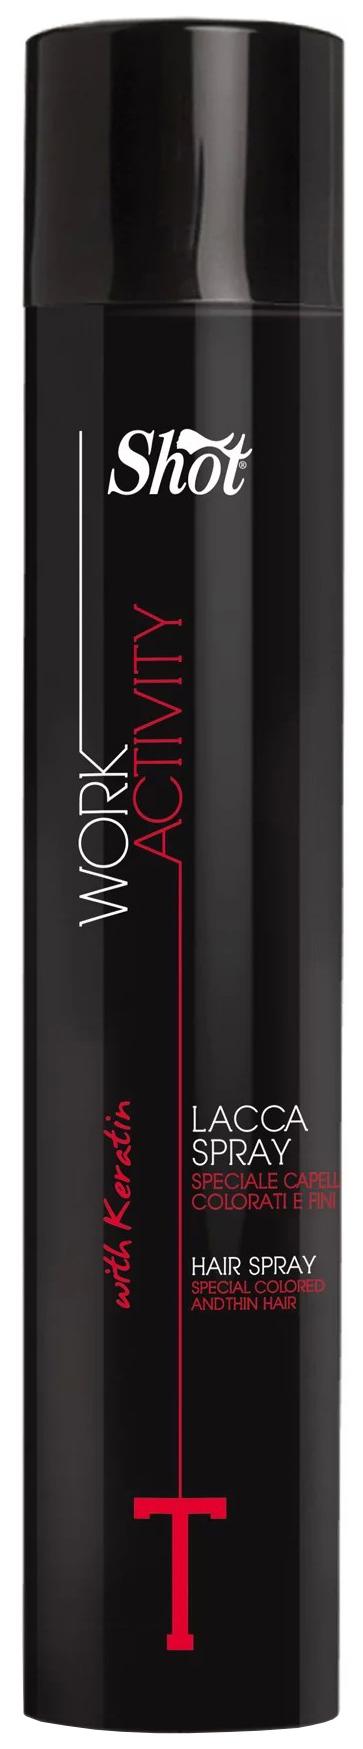 Лак для волос Shot Hair Spray Extra Strong Work Activity Y 490 мл